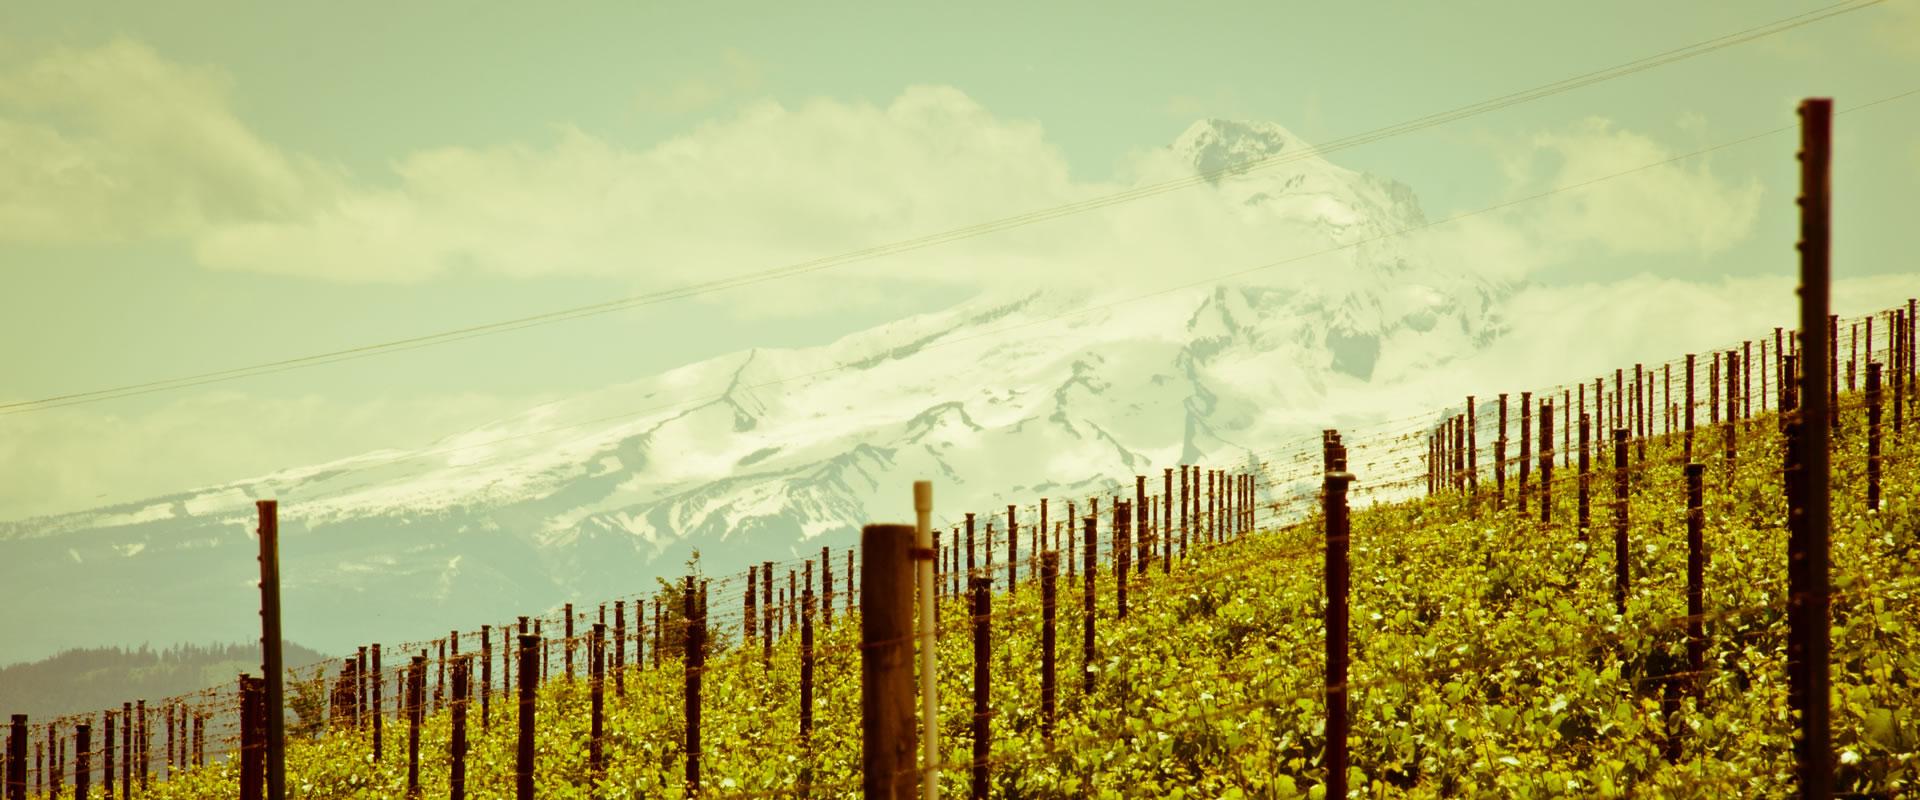 A look at the vineyards at Savage Grace.